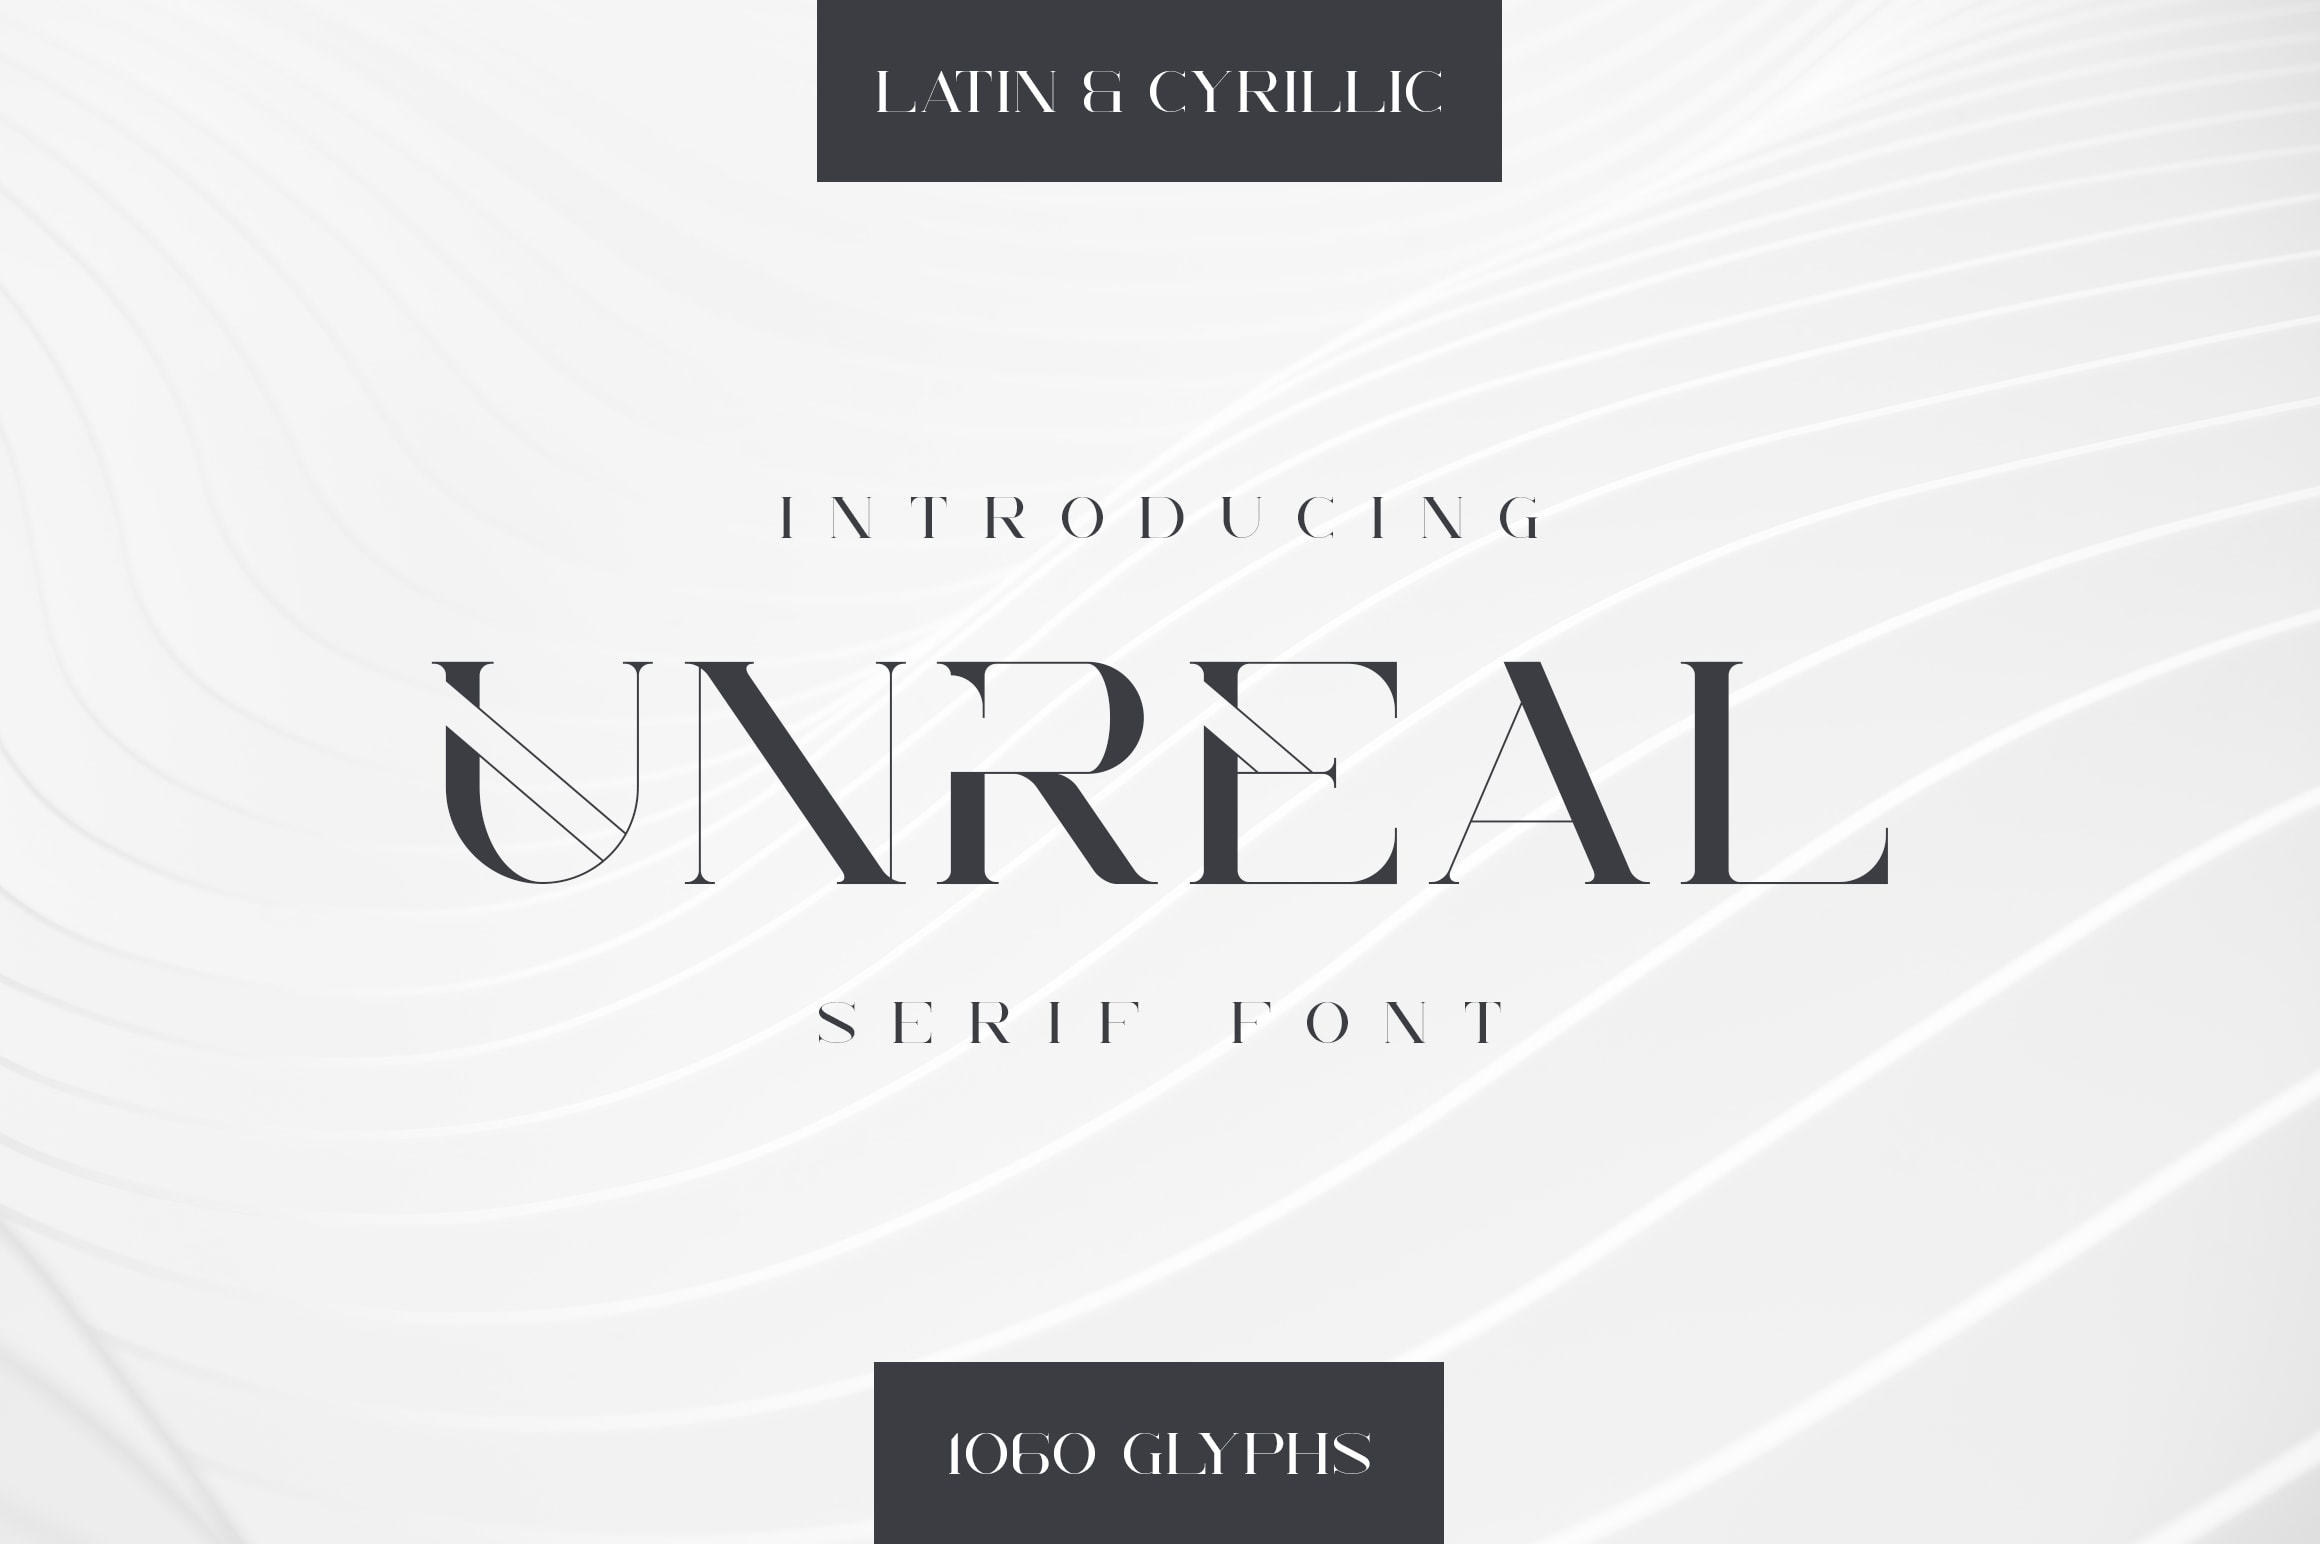 Unreal Serif Font: Latin & Cyrillic - 1 min